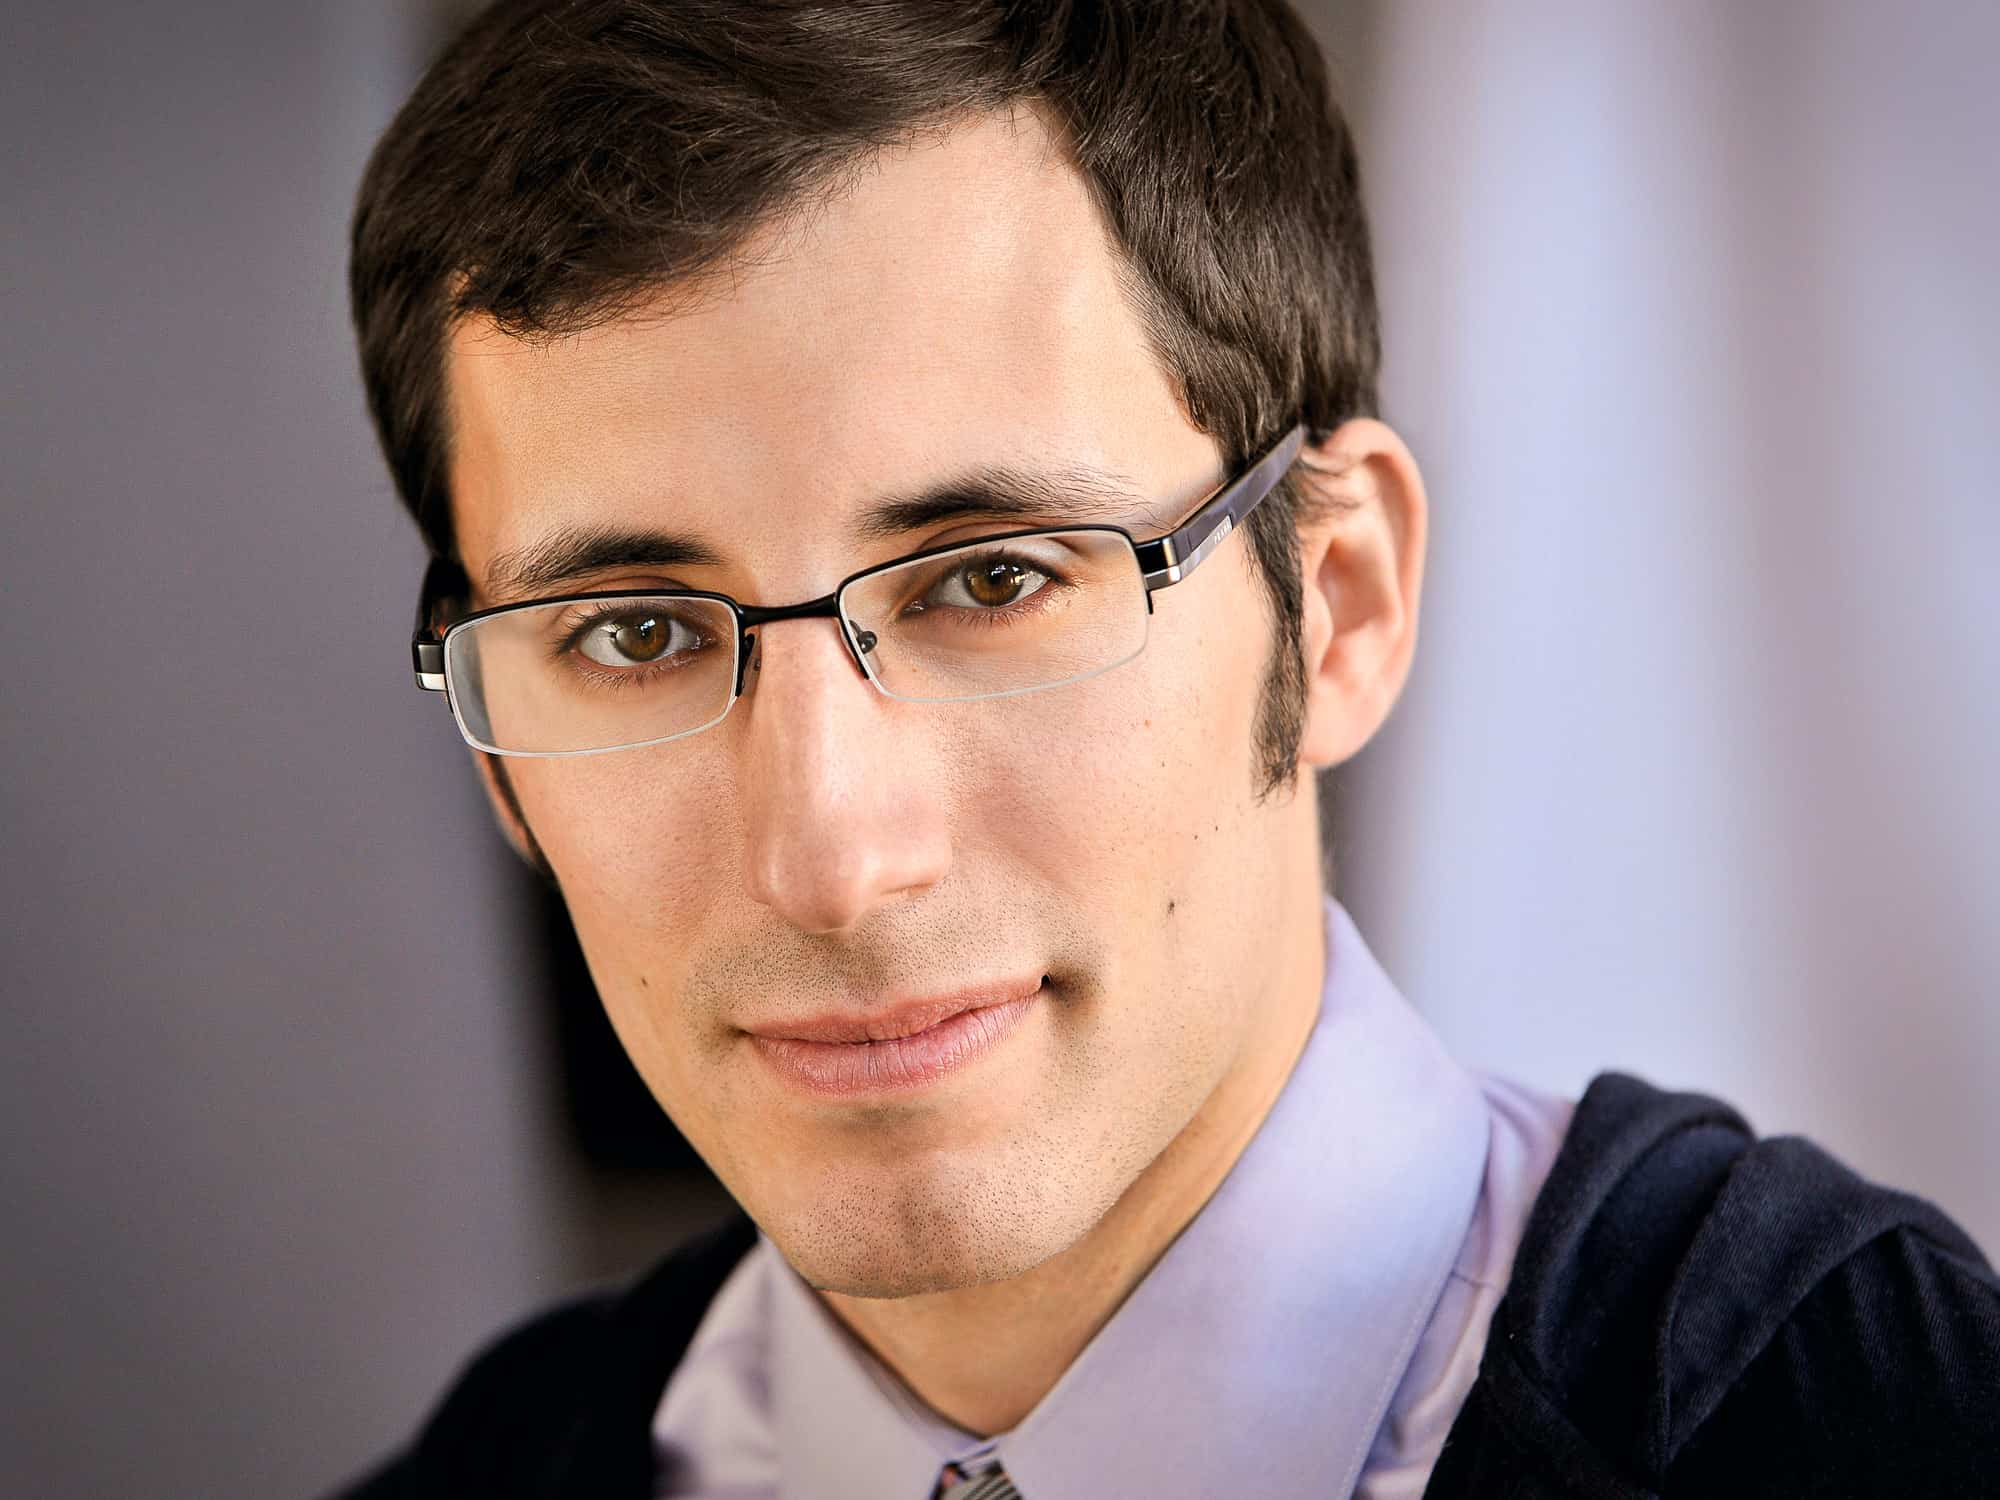 Headshots NYC - Actor Headshots Phil M